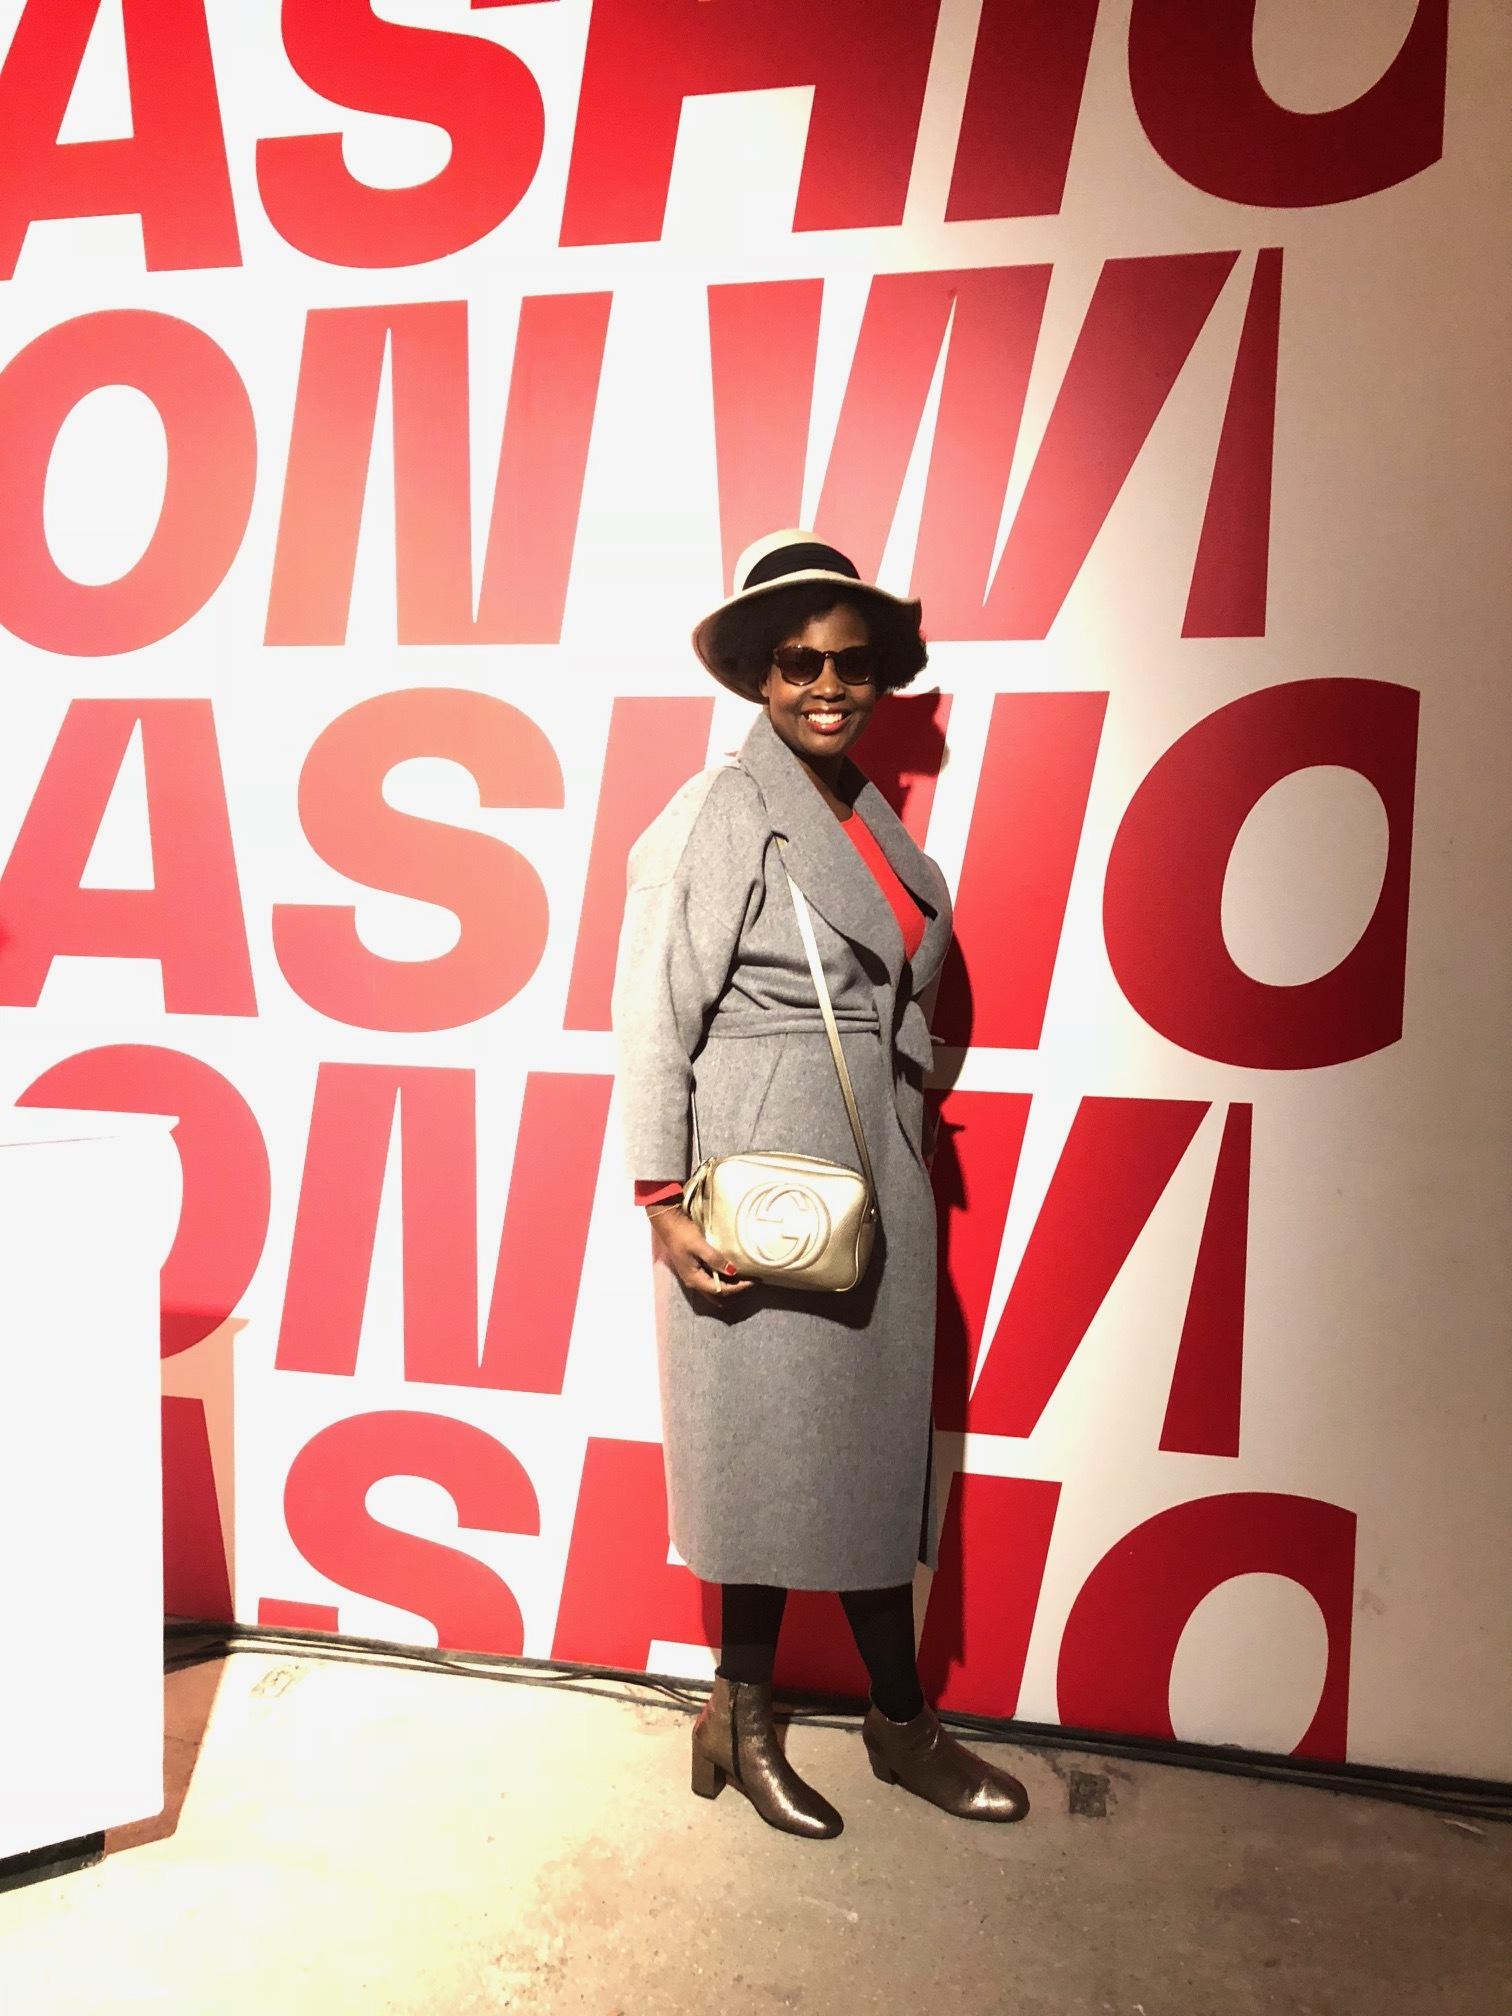 London-Fashion-week-festival-photocall-2-elisa-les-bons-tuyaux.jpg